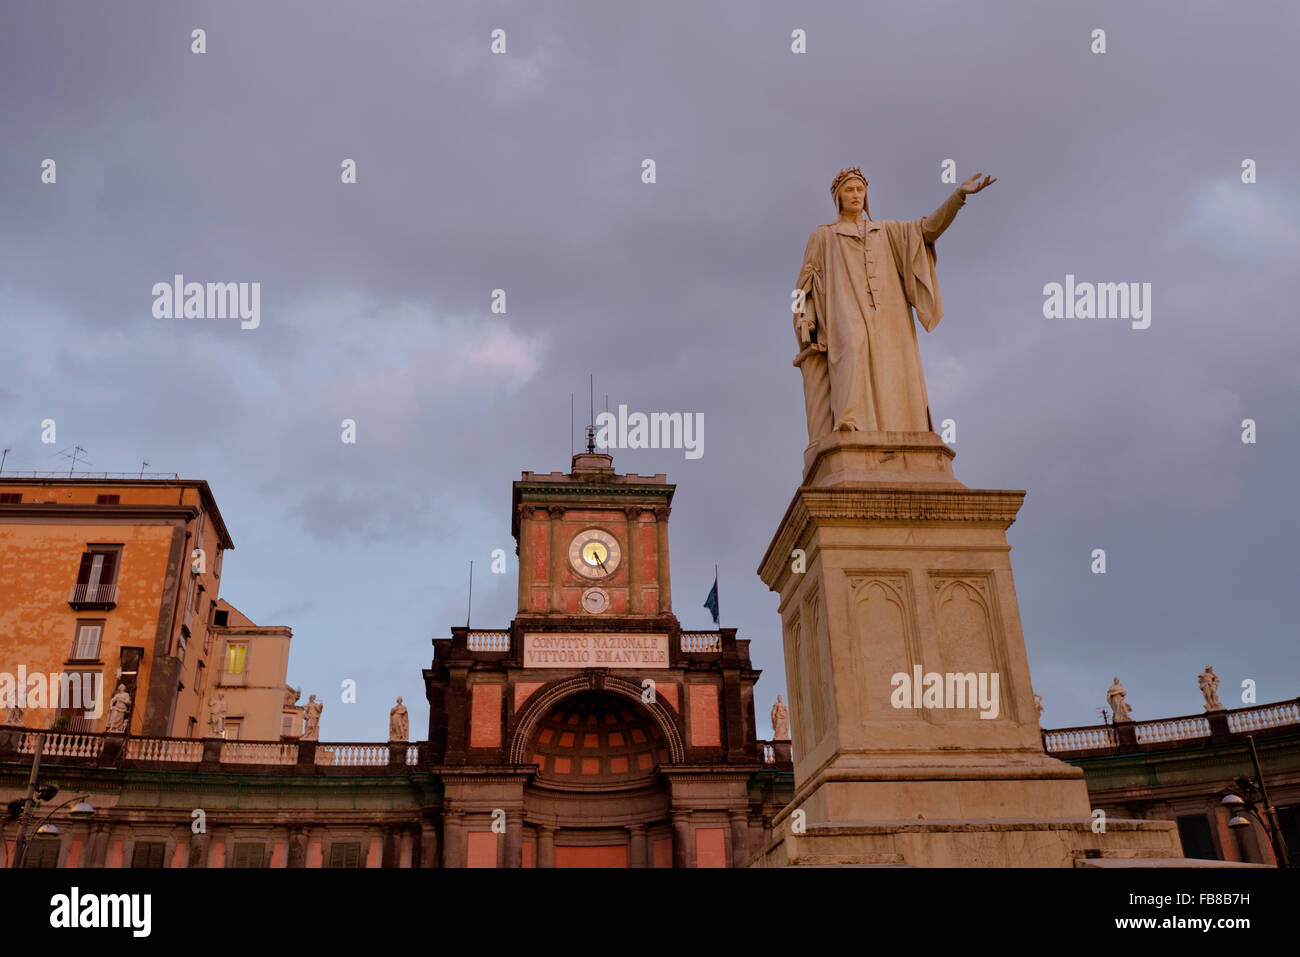 Piazza Dante, Quartiere San Giuseppe, Napoli, Campania, Italy - Stock Image